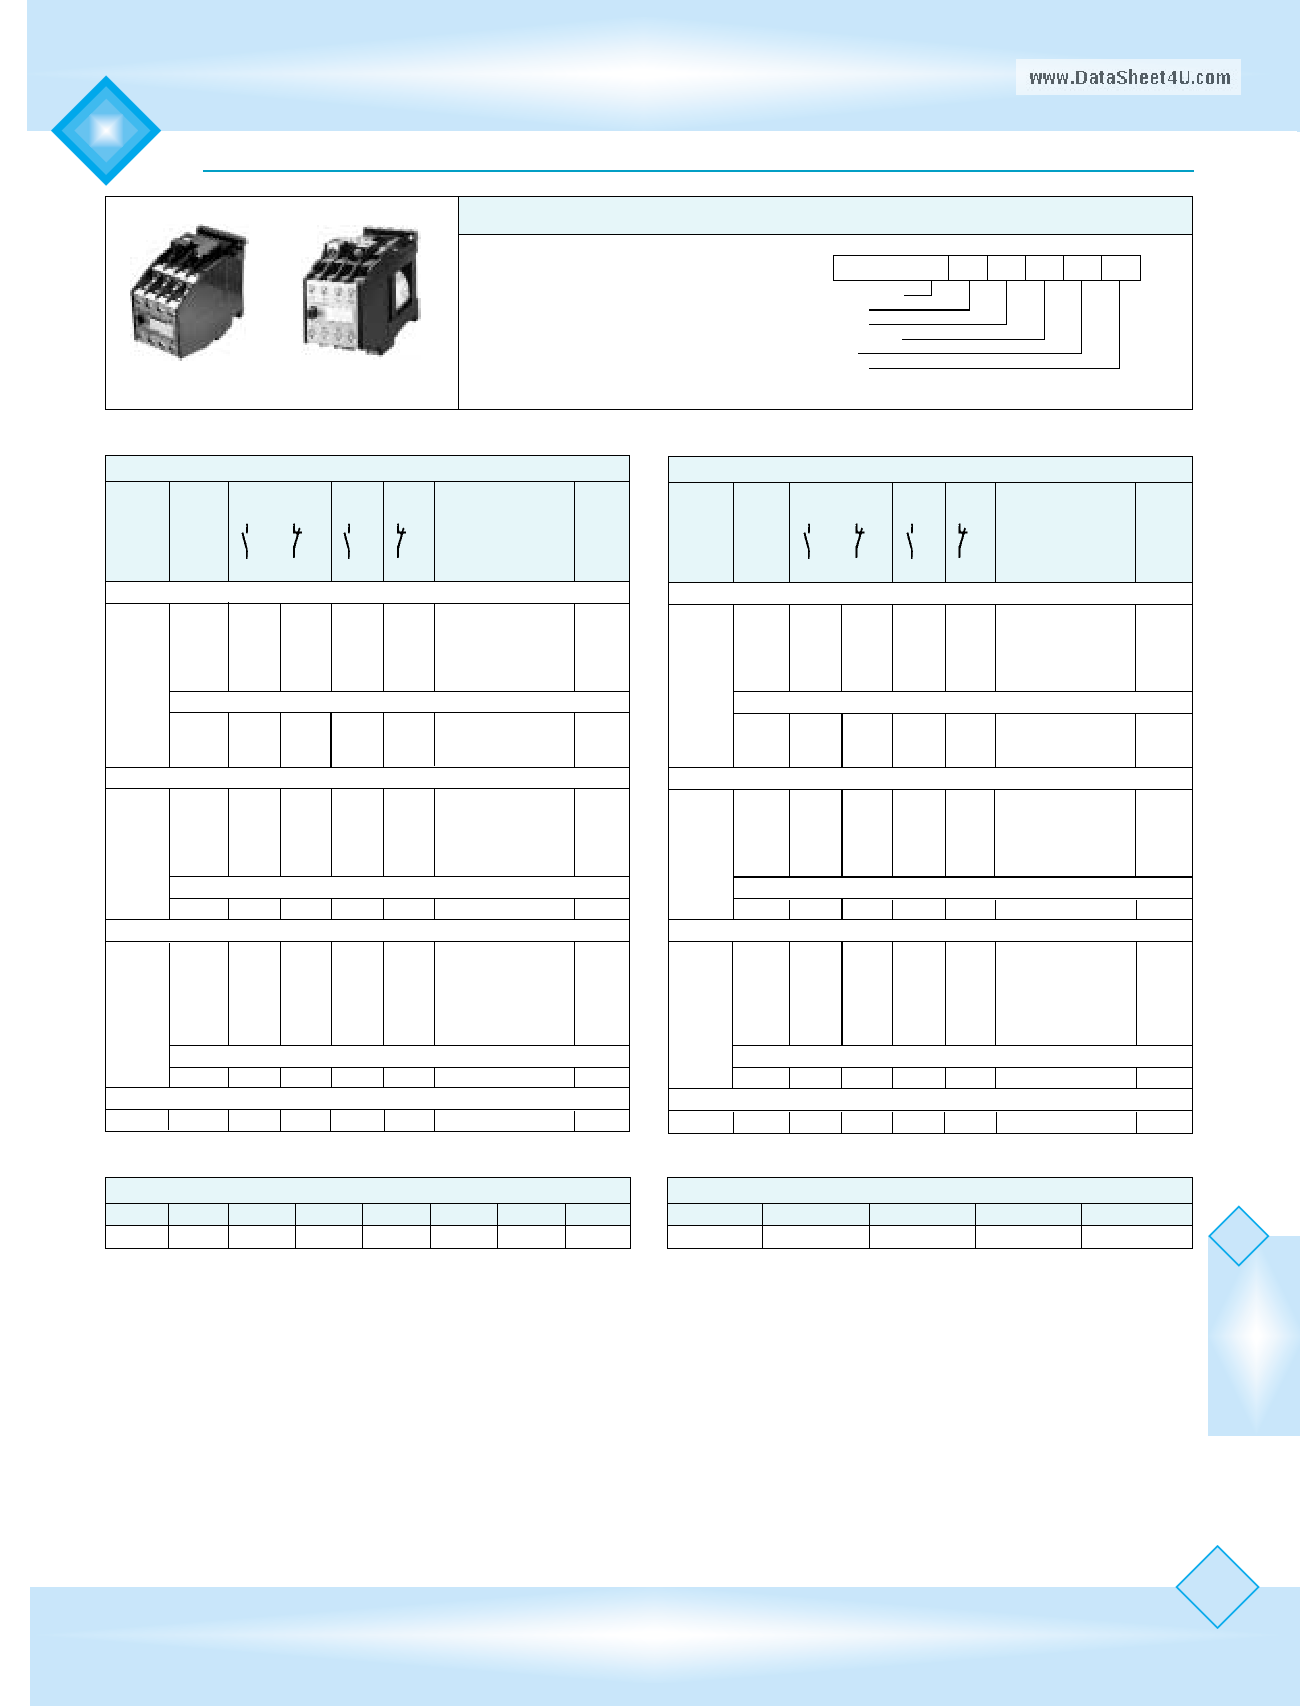 3TH4271-0B Datasheet, 3TH4271-0B PDF,ピン配置, 機能